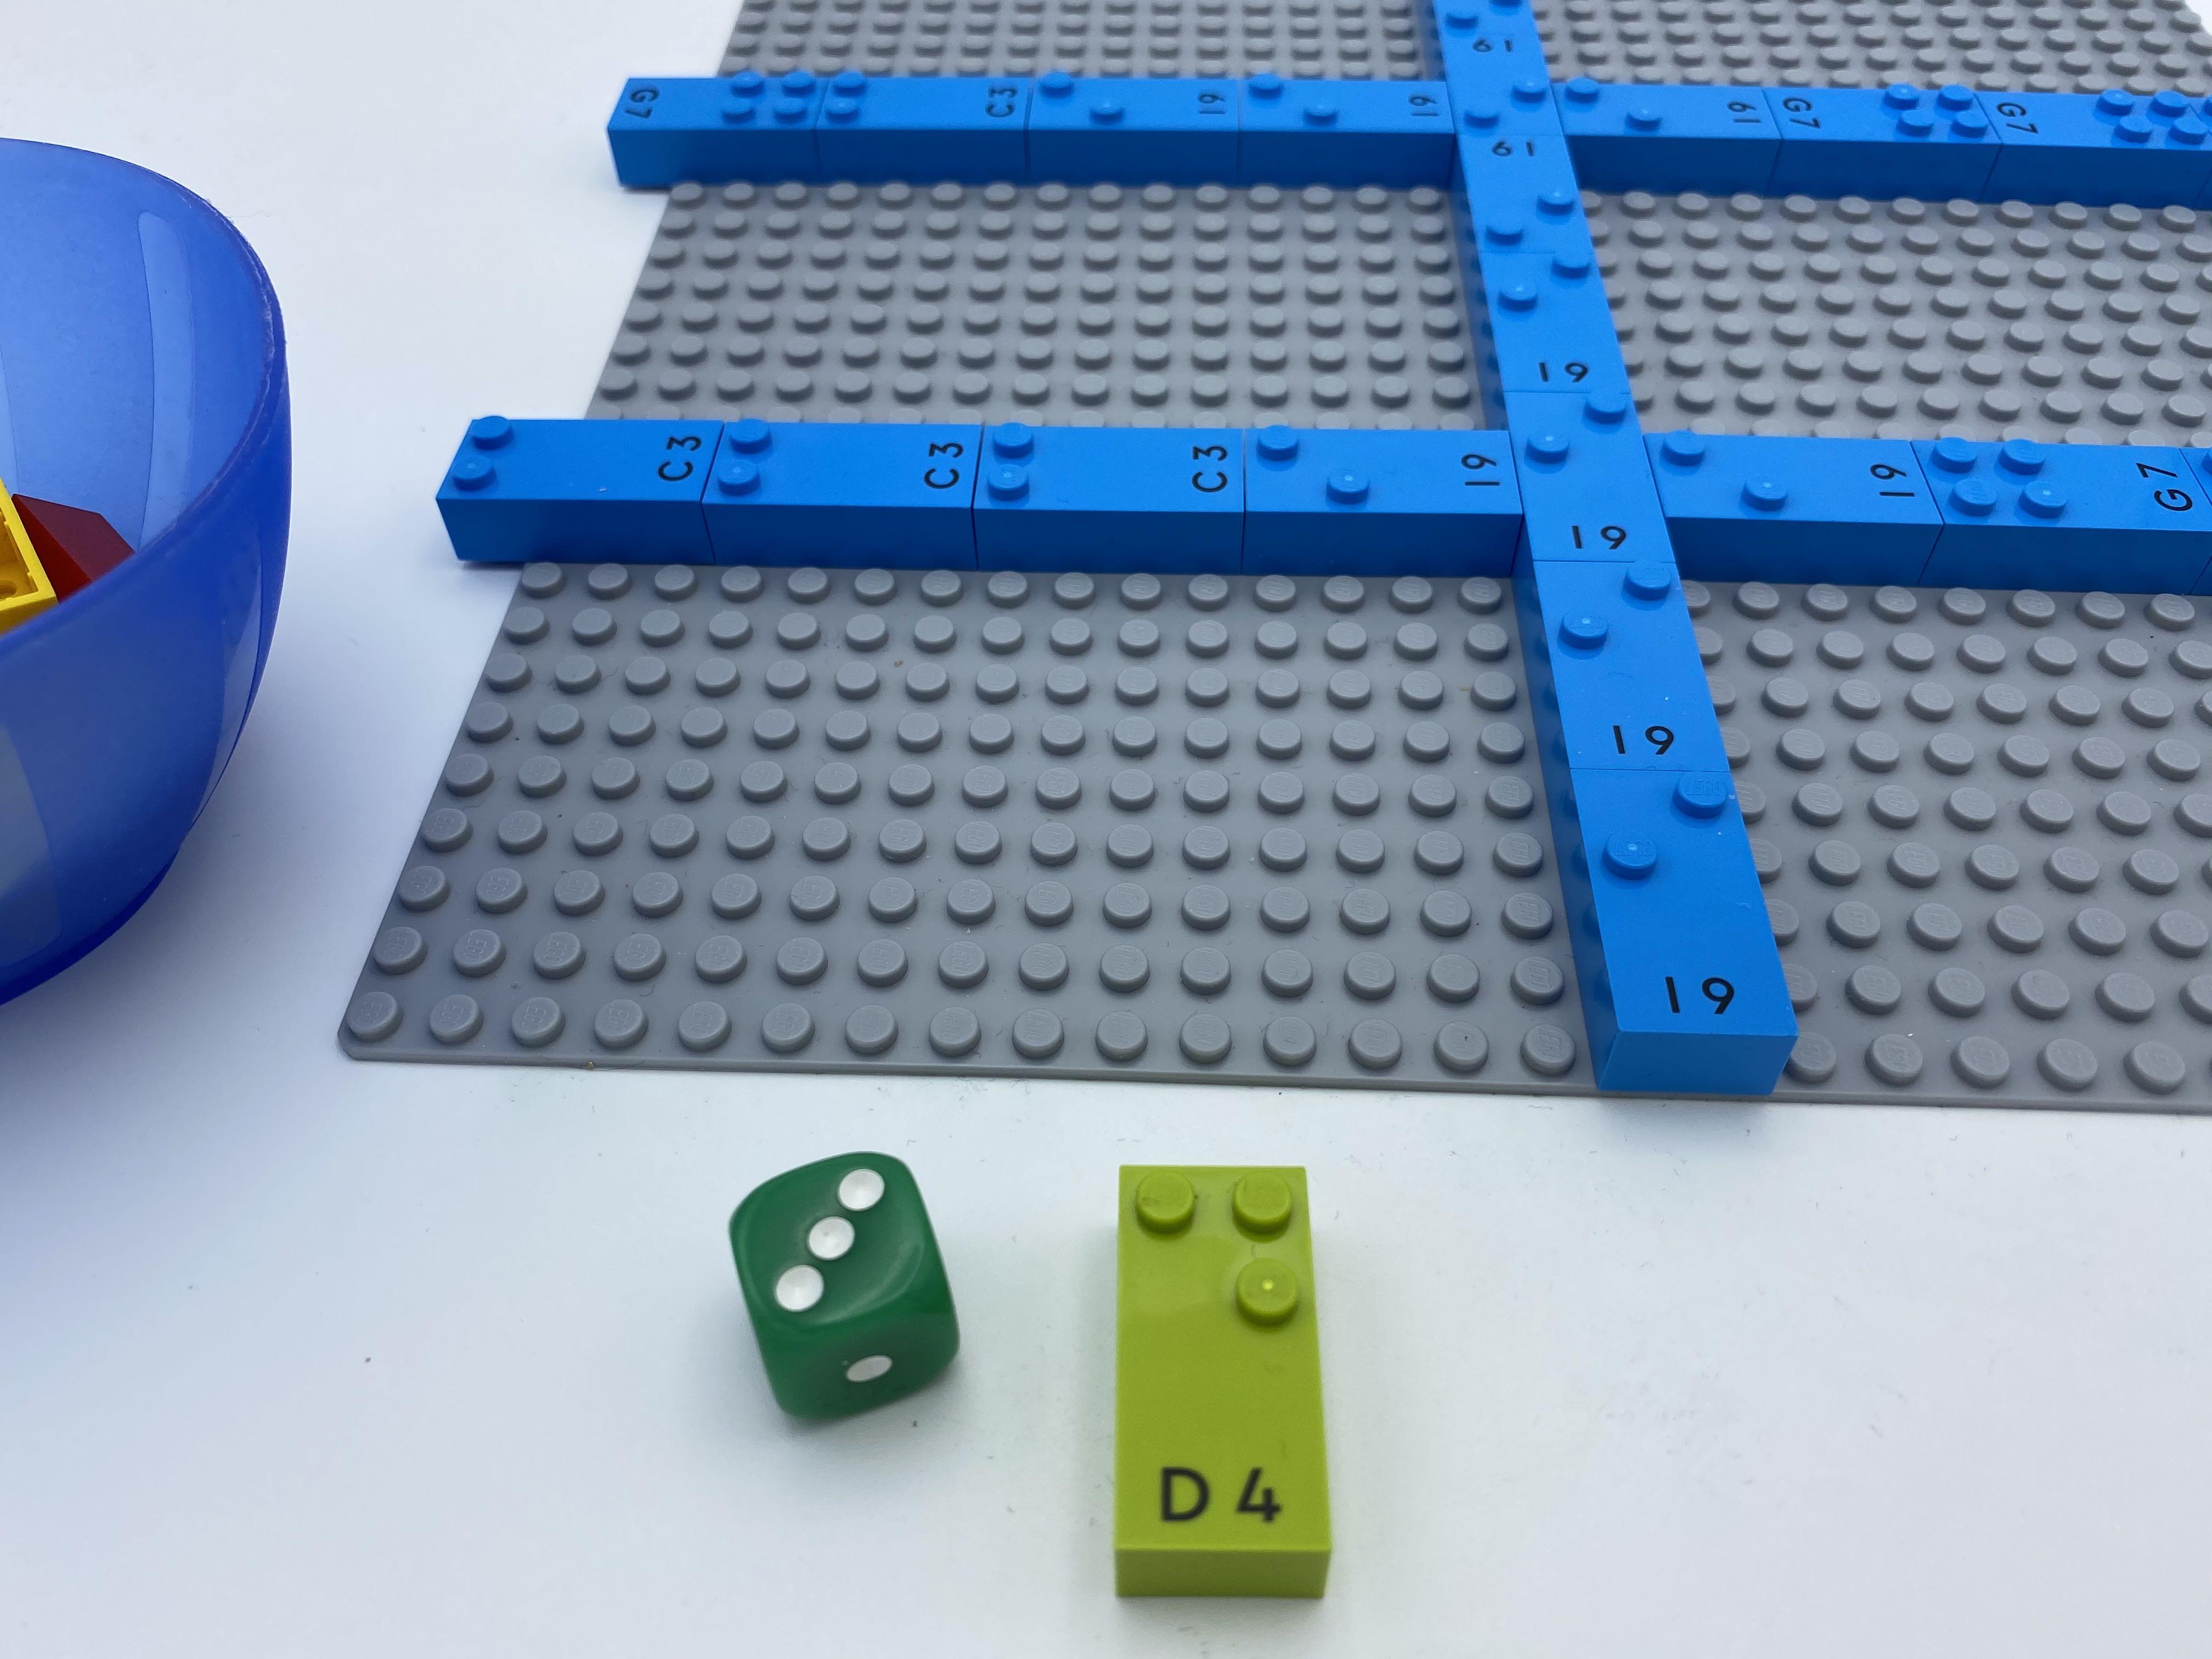 die 1 shows 3, letter brick d.